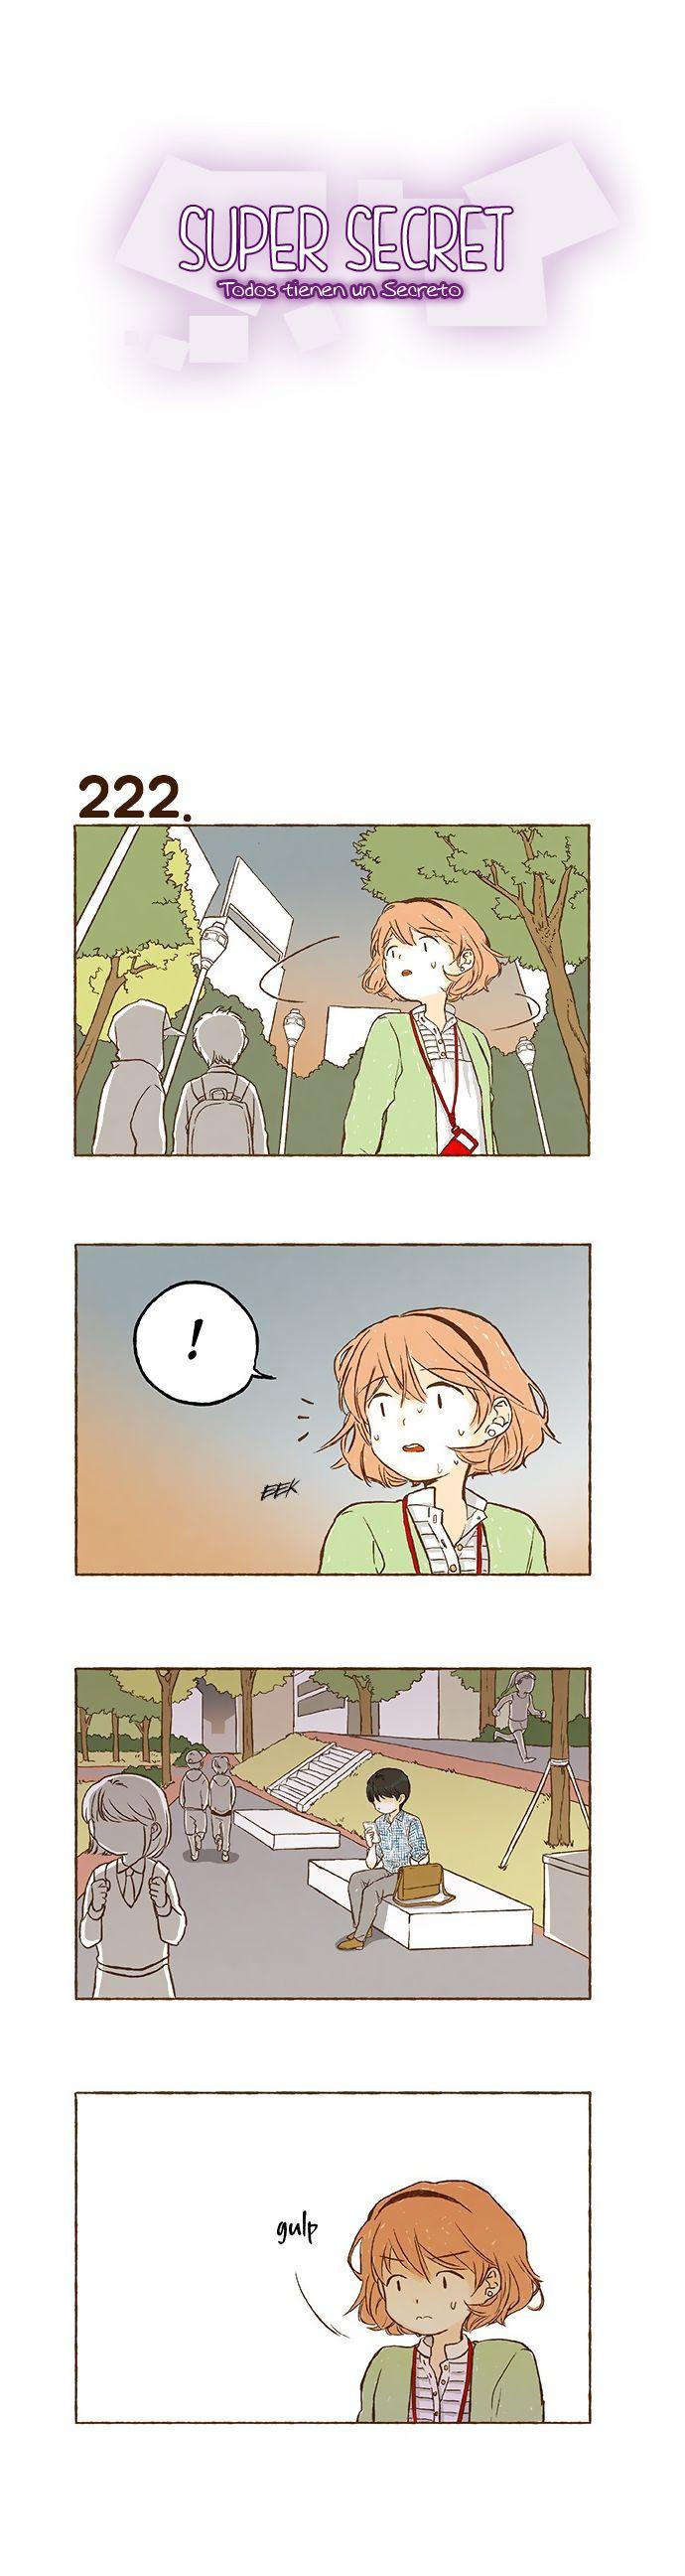 http://c5.ninemanga.com/es_manga/pic2/61/17725/512455/532f46f52e673dcf04c80bd66f92ce38.jpg Page 2